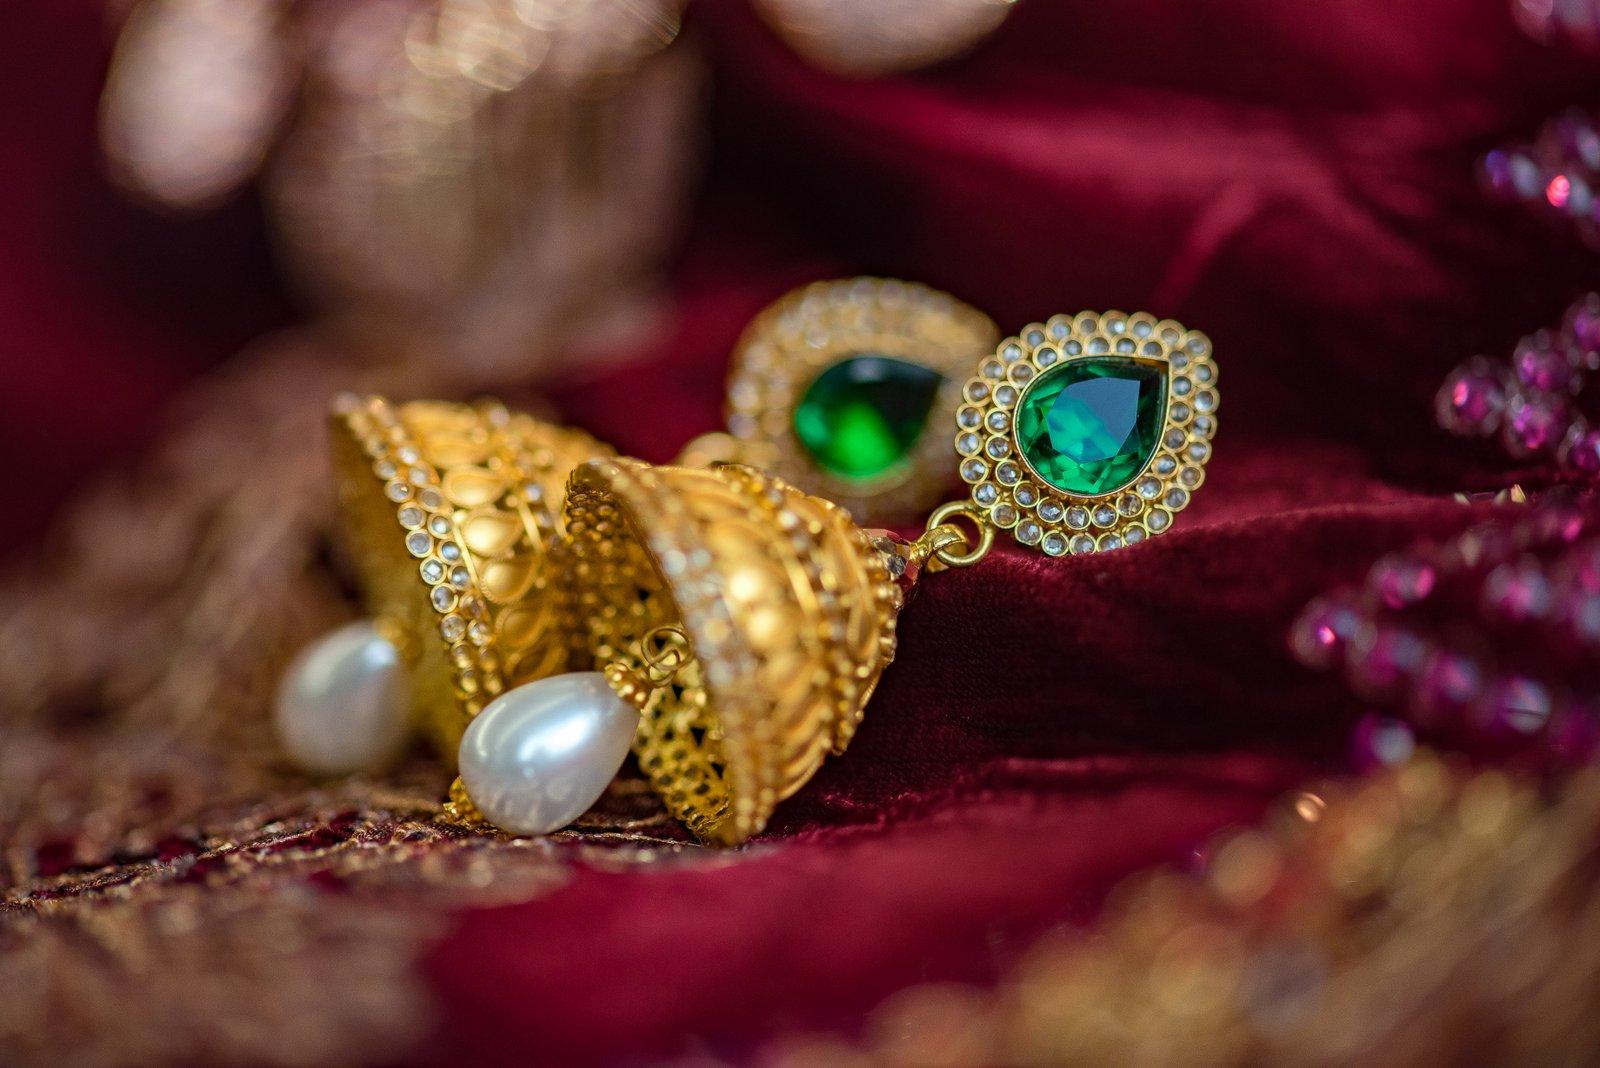 Farhana + Bashir, Miami Wedding Photographers | Häring Photography, Indian Wedding Photographer in Florida, Best Muslim, Hindu - South East Asian Wedding Photographers